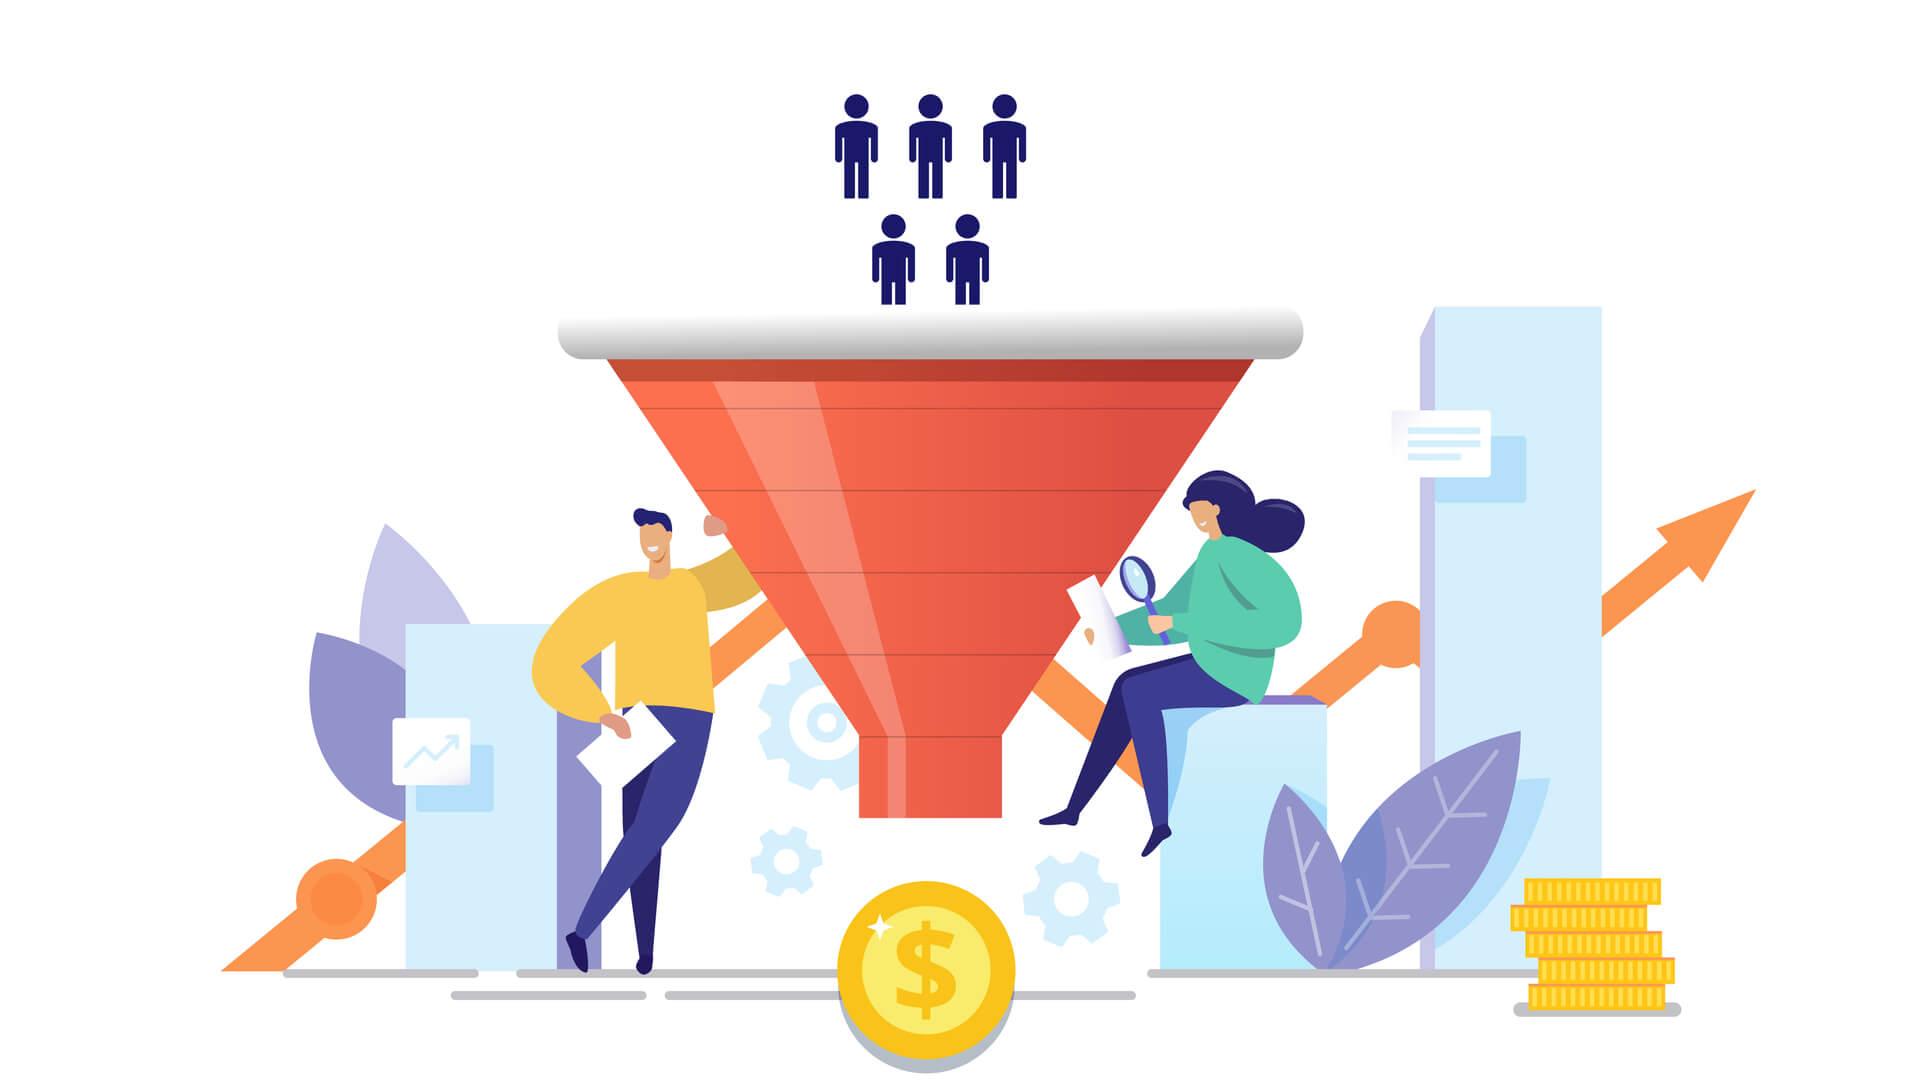 , Drive Revenue In Todays World, #Bizwhiznetwork.com Innovation ΛI